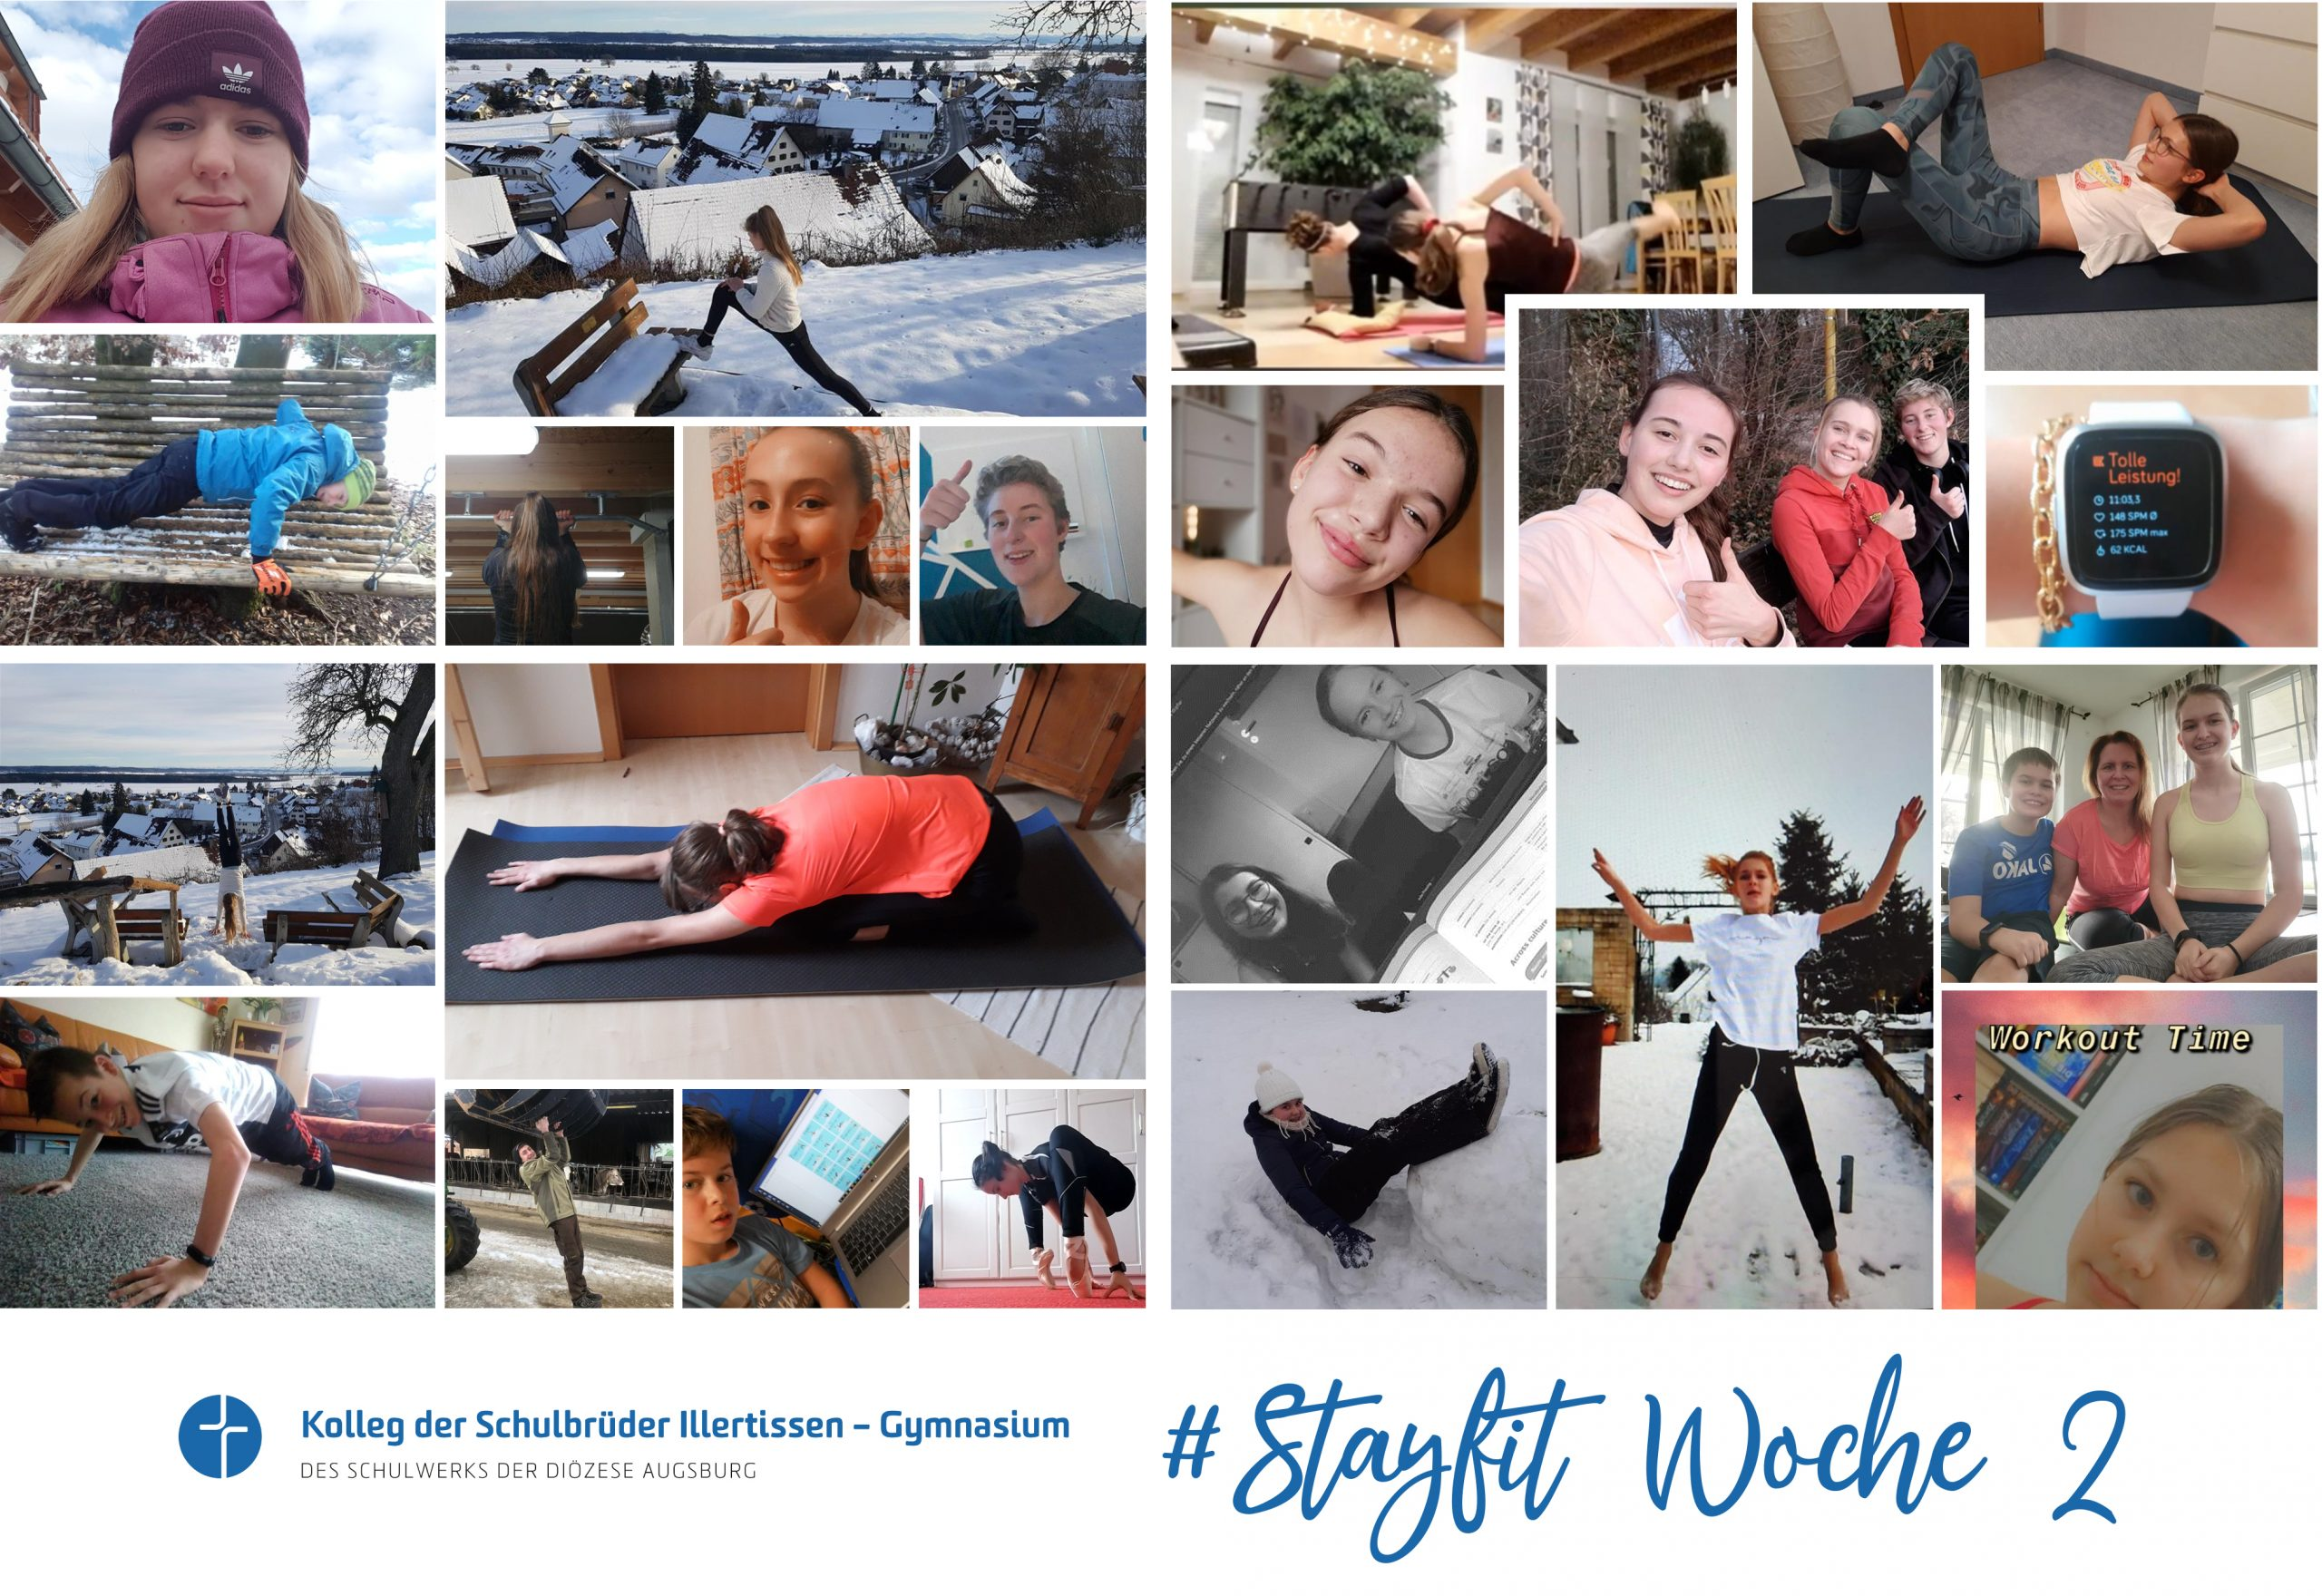 #stayfit Woche 2